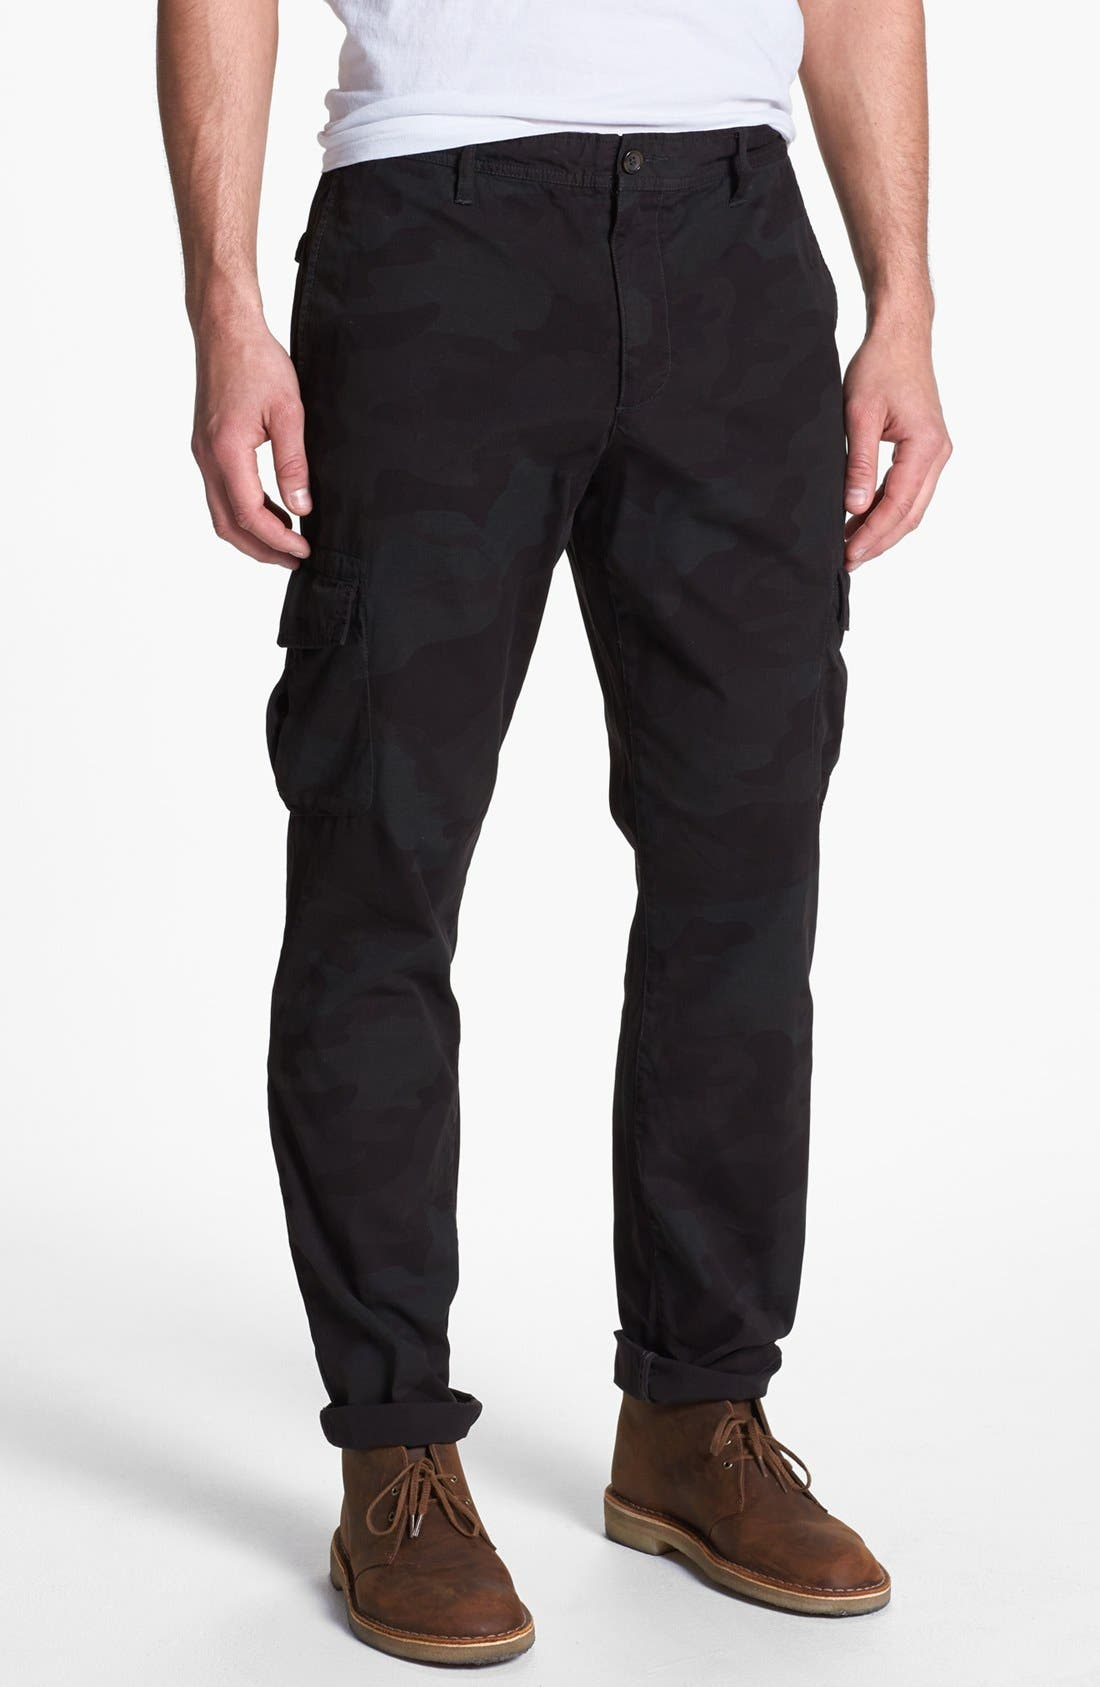 Main Image - Wallin & Bros. 'Riverbend' Camo Cargo Pants